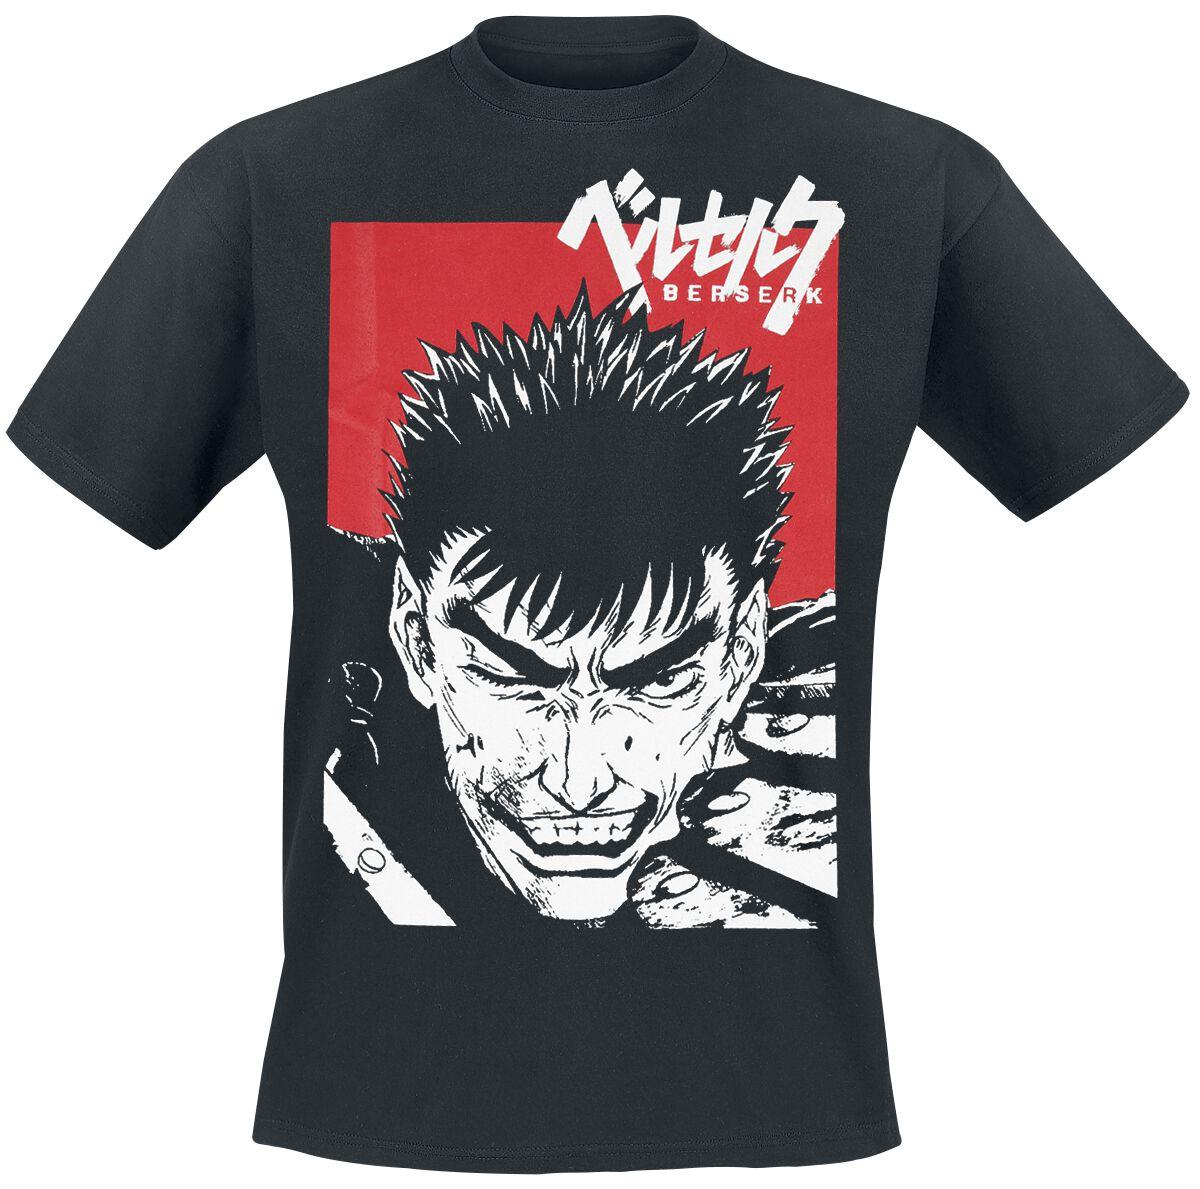 Merch dla Fanów - Koszulki - T-Shirt Beserk Guts T-Shirt czarny - 364650